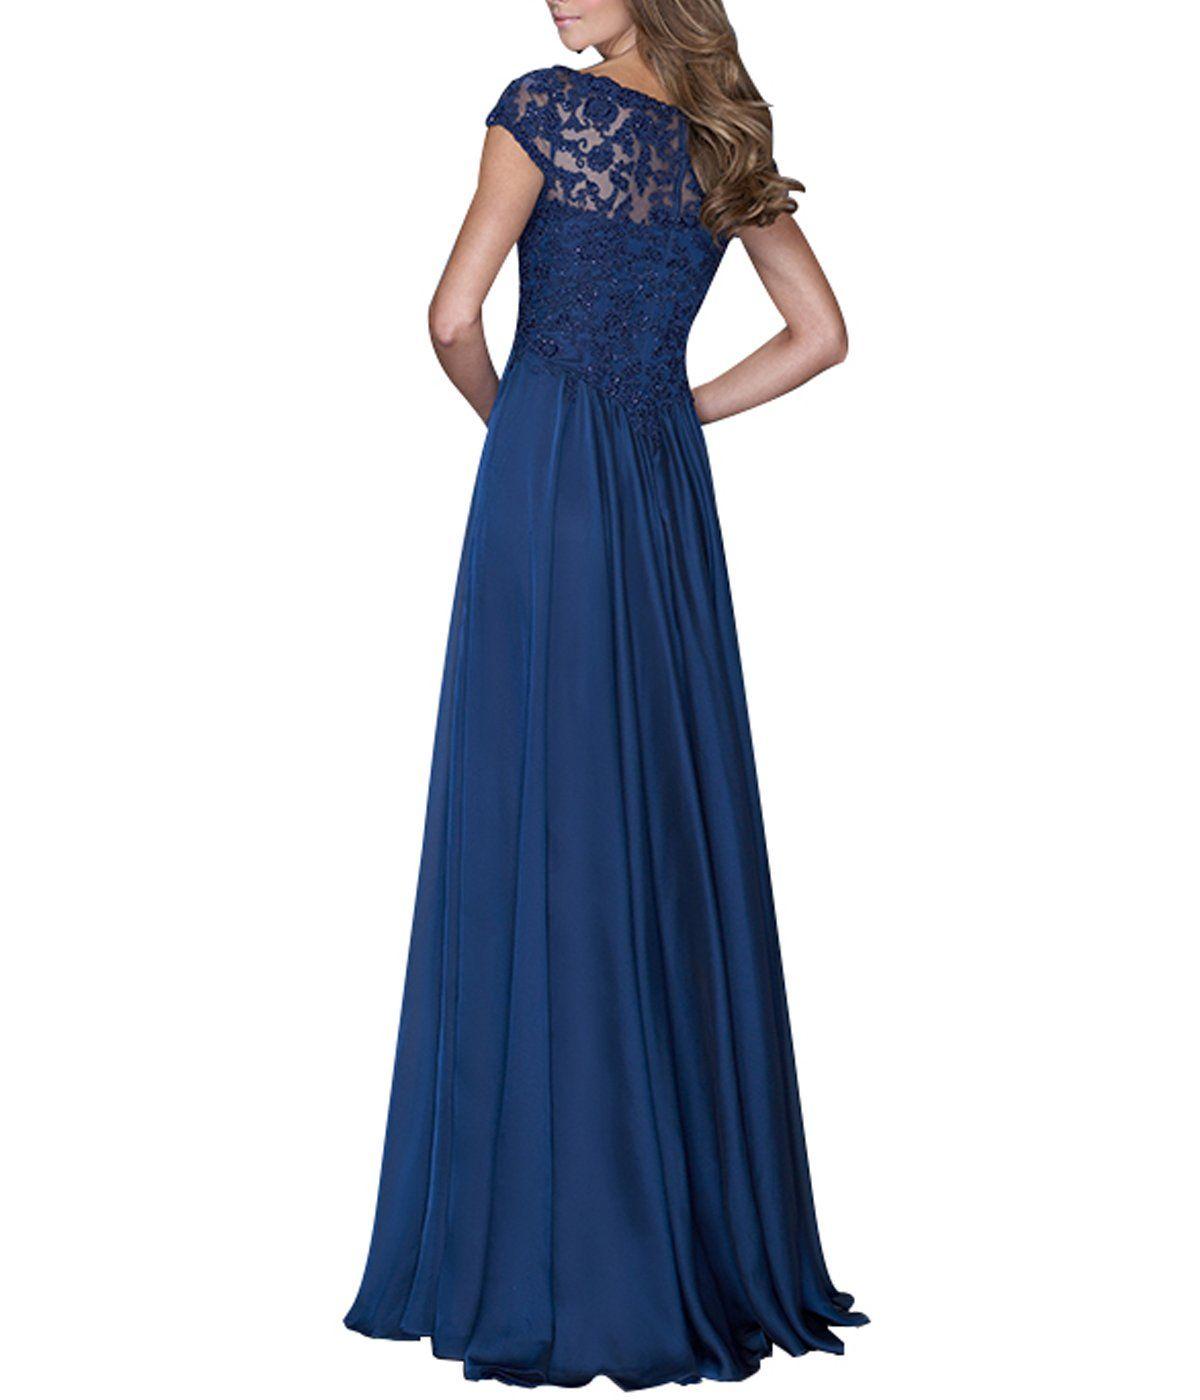 Burgundy lace a line bridesmaid dress v neck cap sleeve long chiffon